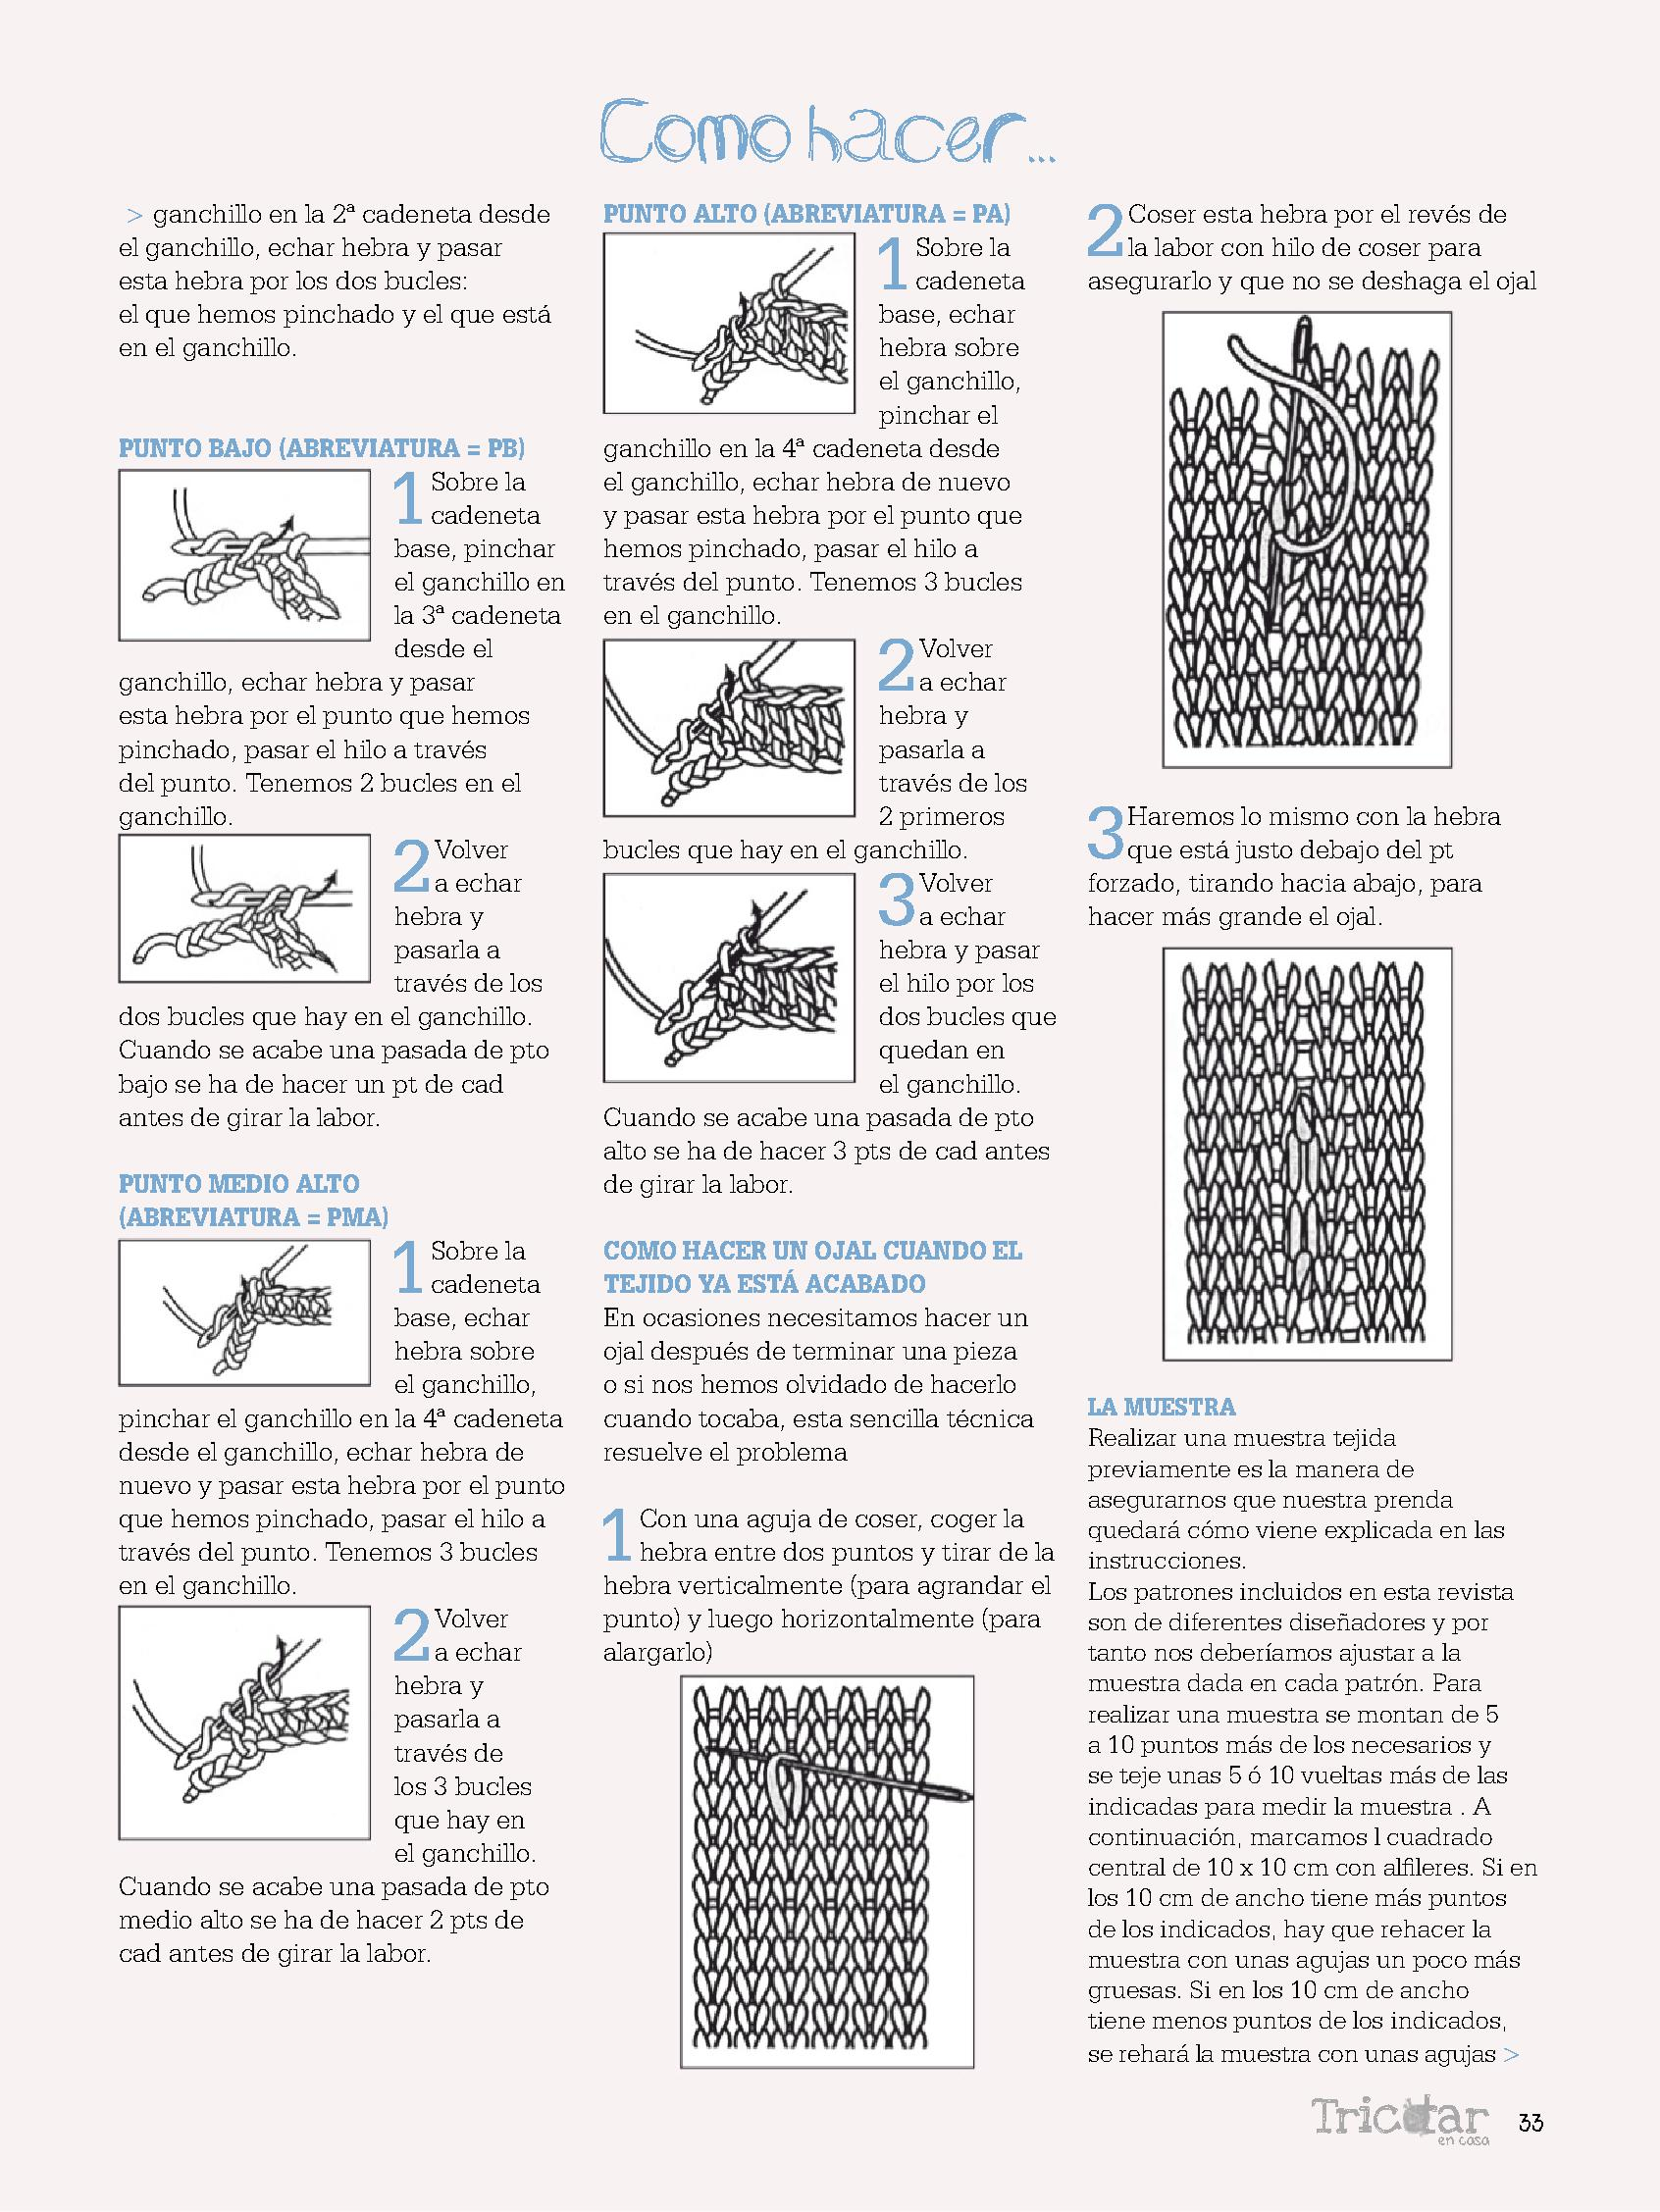 Page_00034.jpg